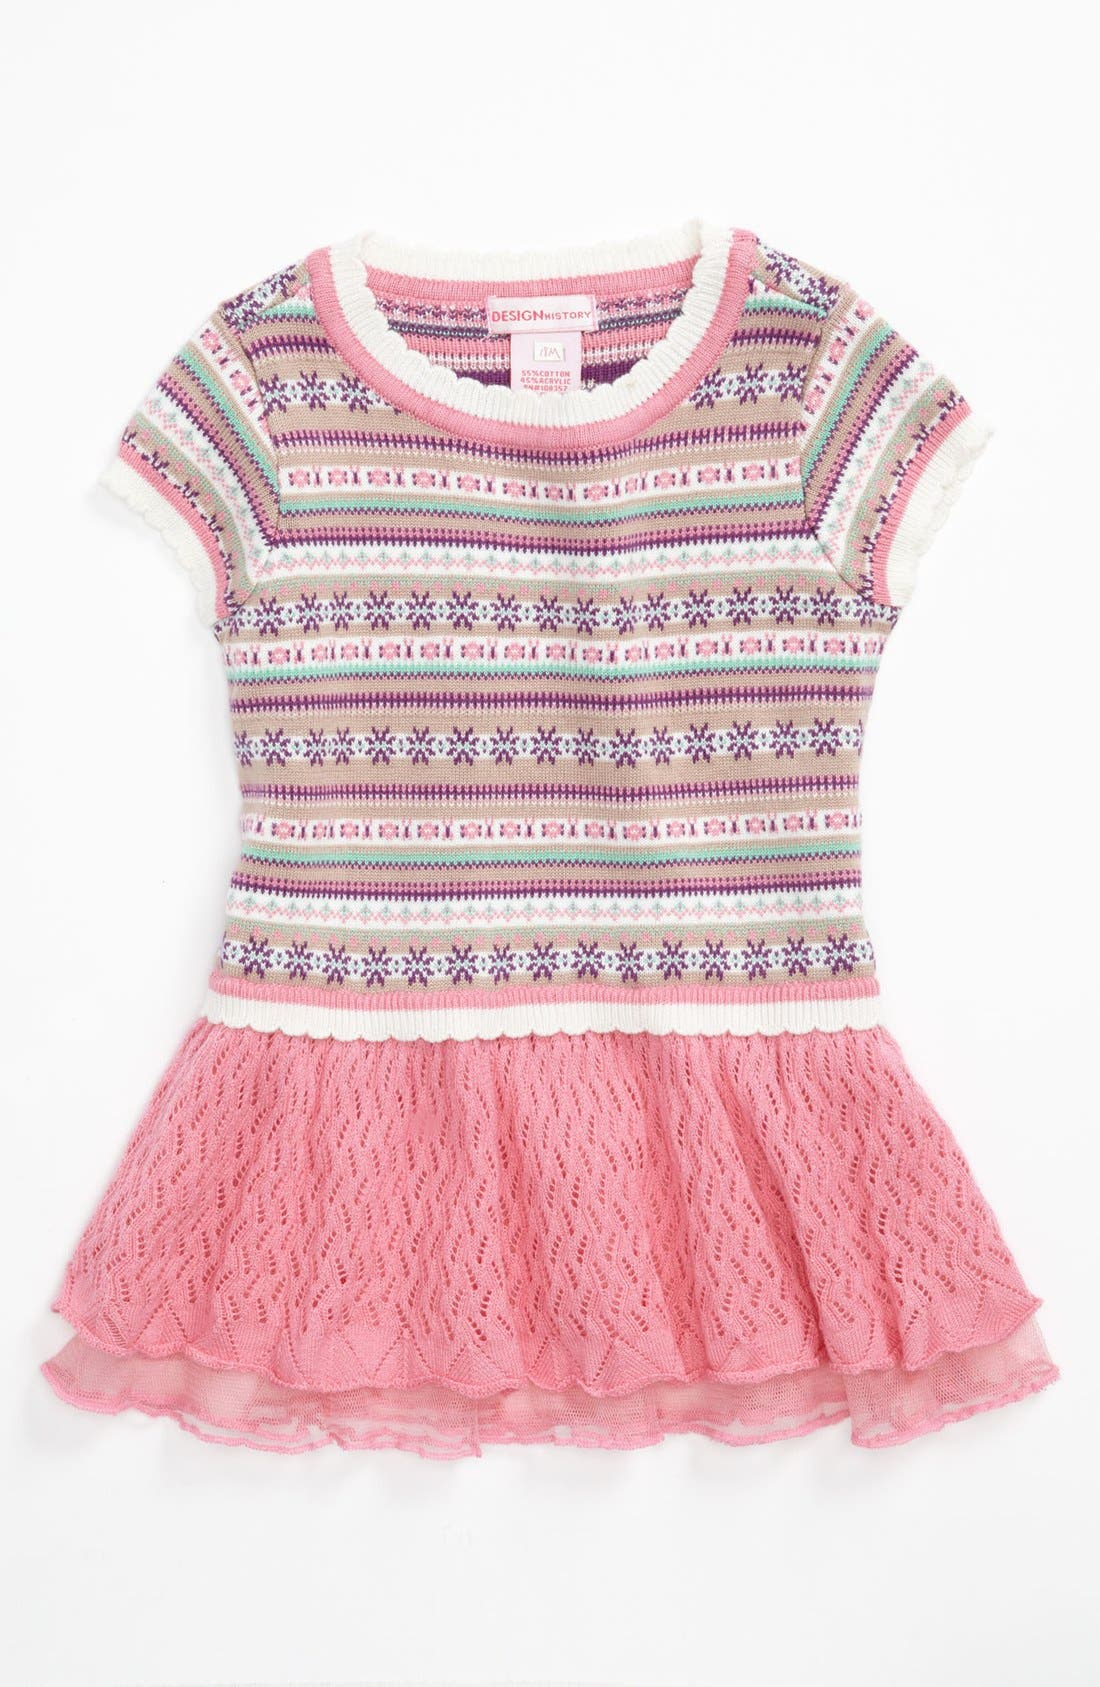 Main Image - Design History 'Fair Isle' Dress (Baby Girls)